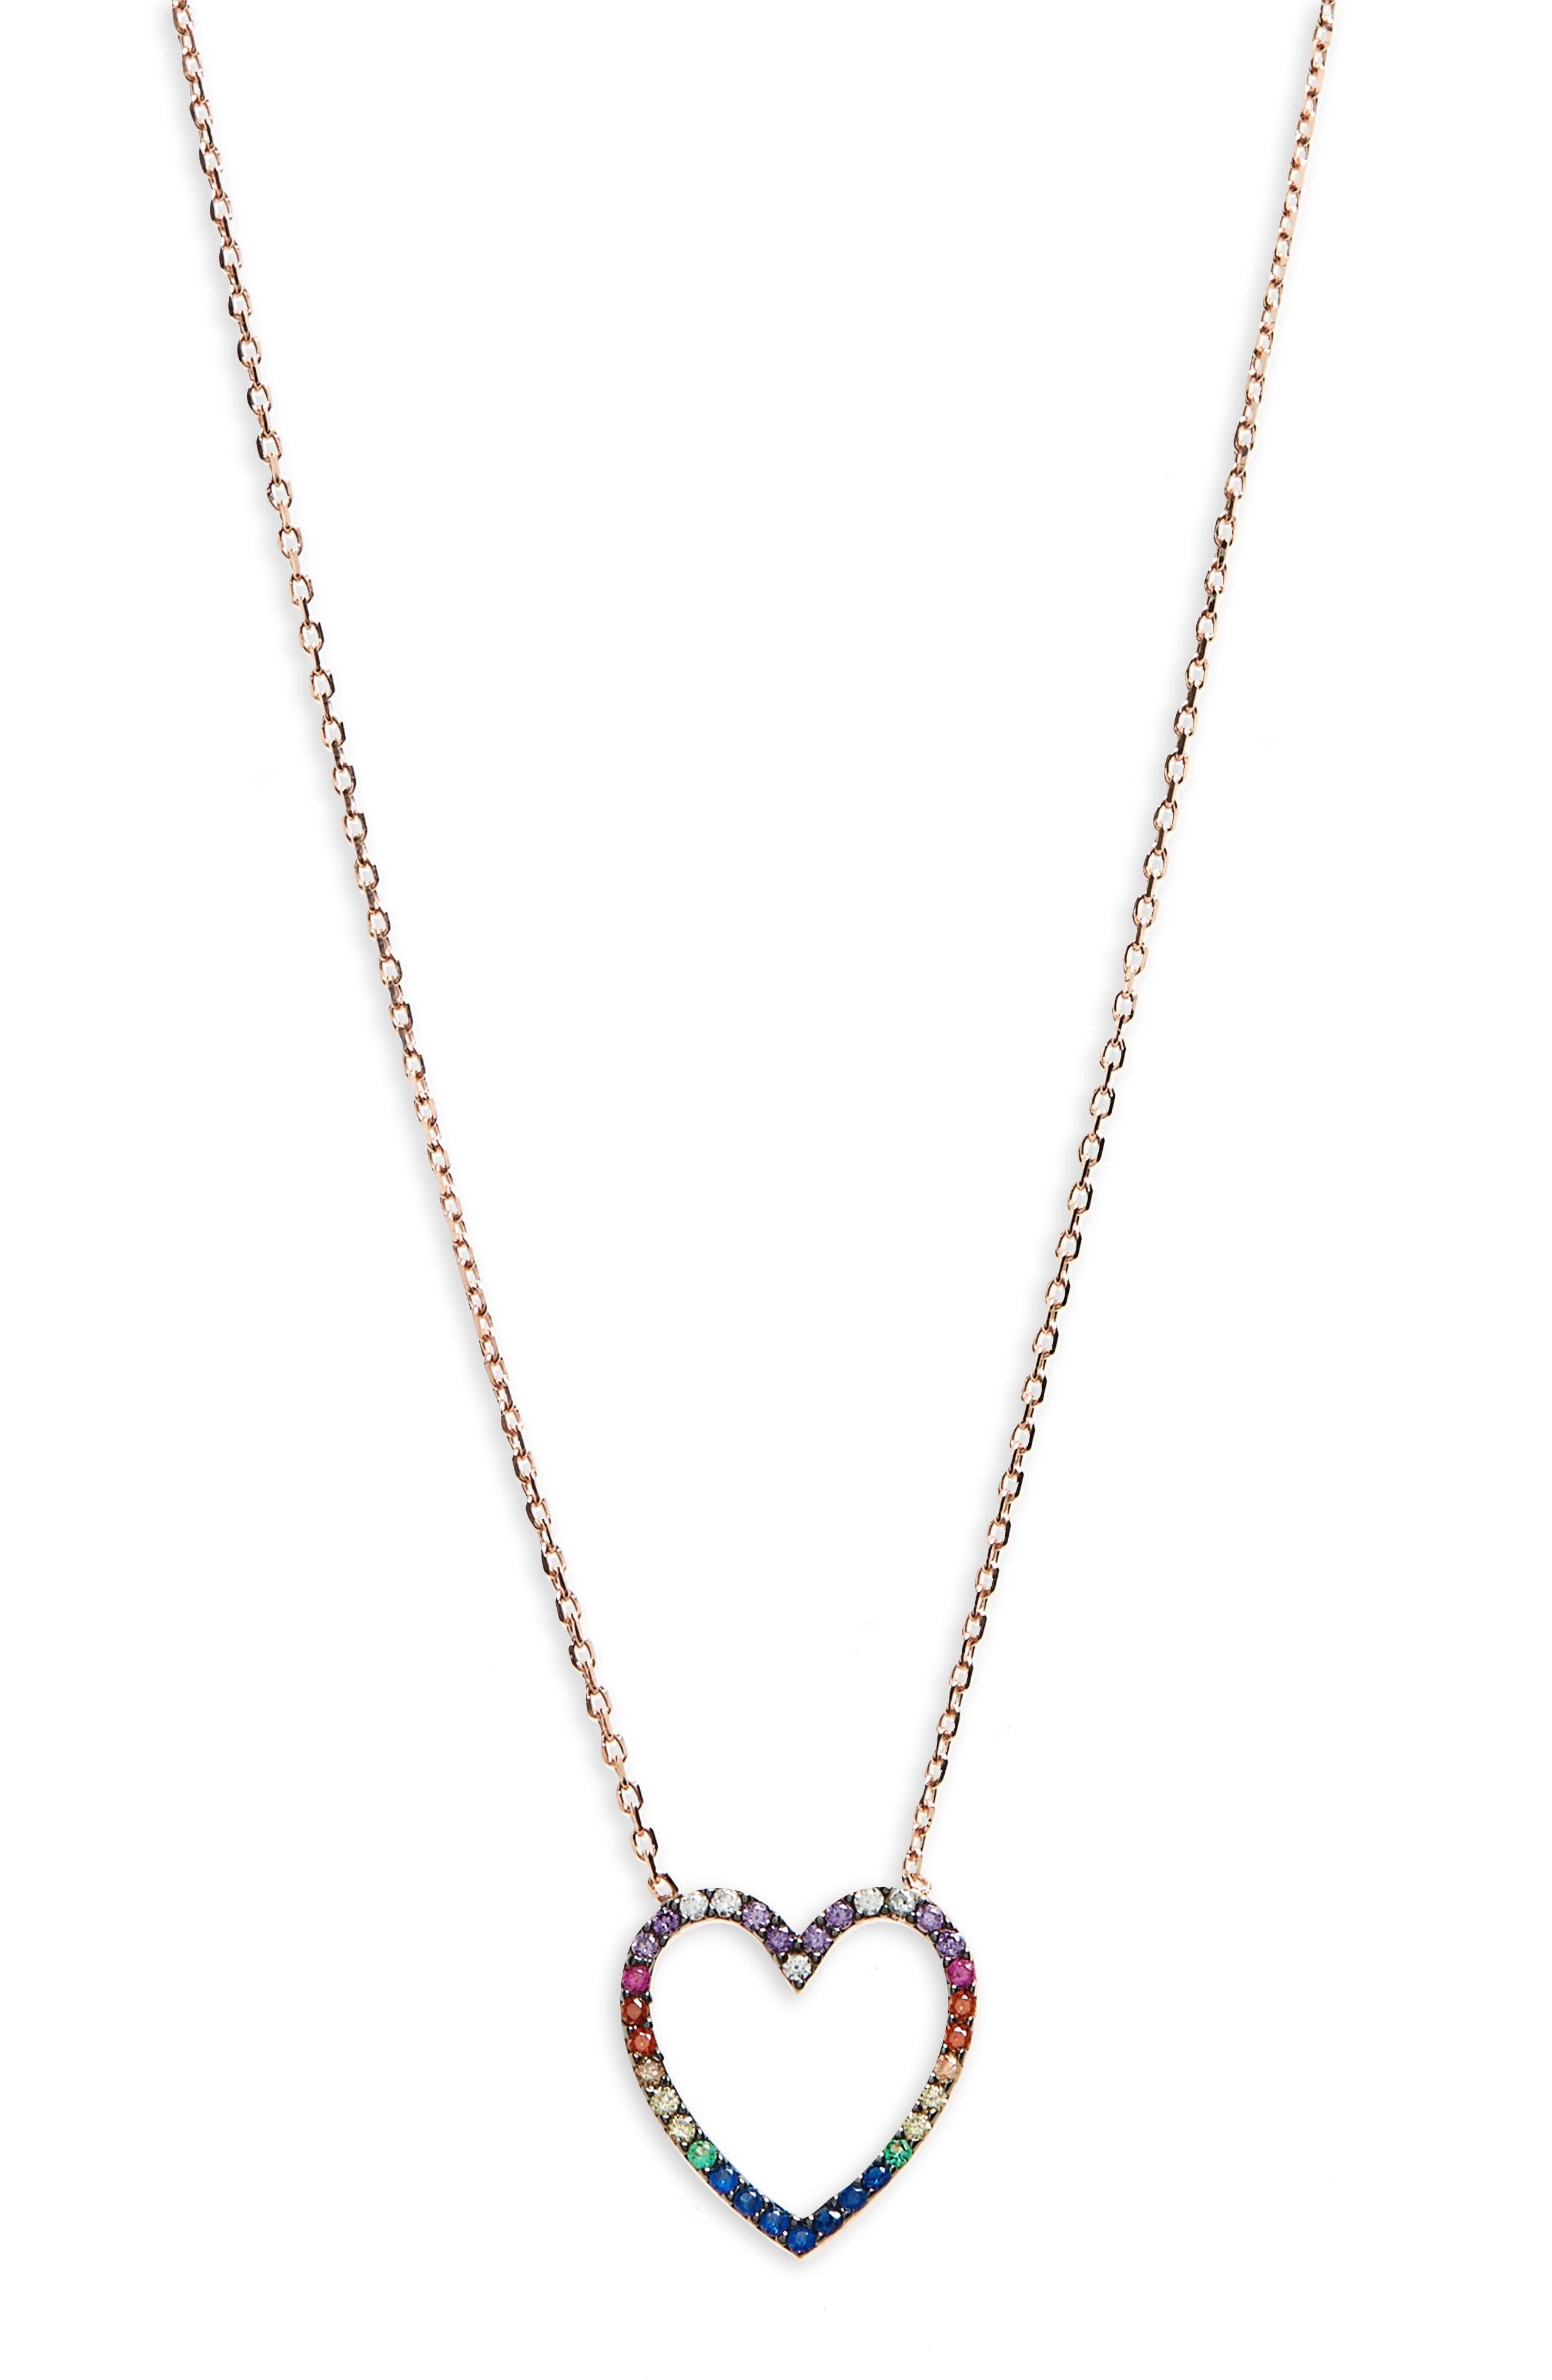 Rainbow Heart Pendant Necklace,                             Main thumbnail 1, color,                             Rose Gold/ Multi